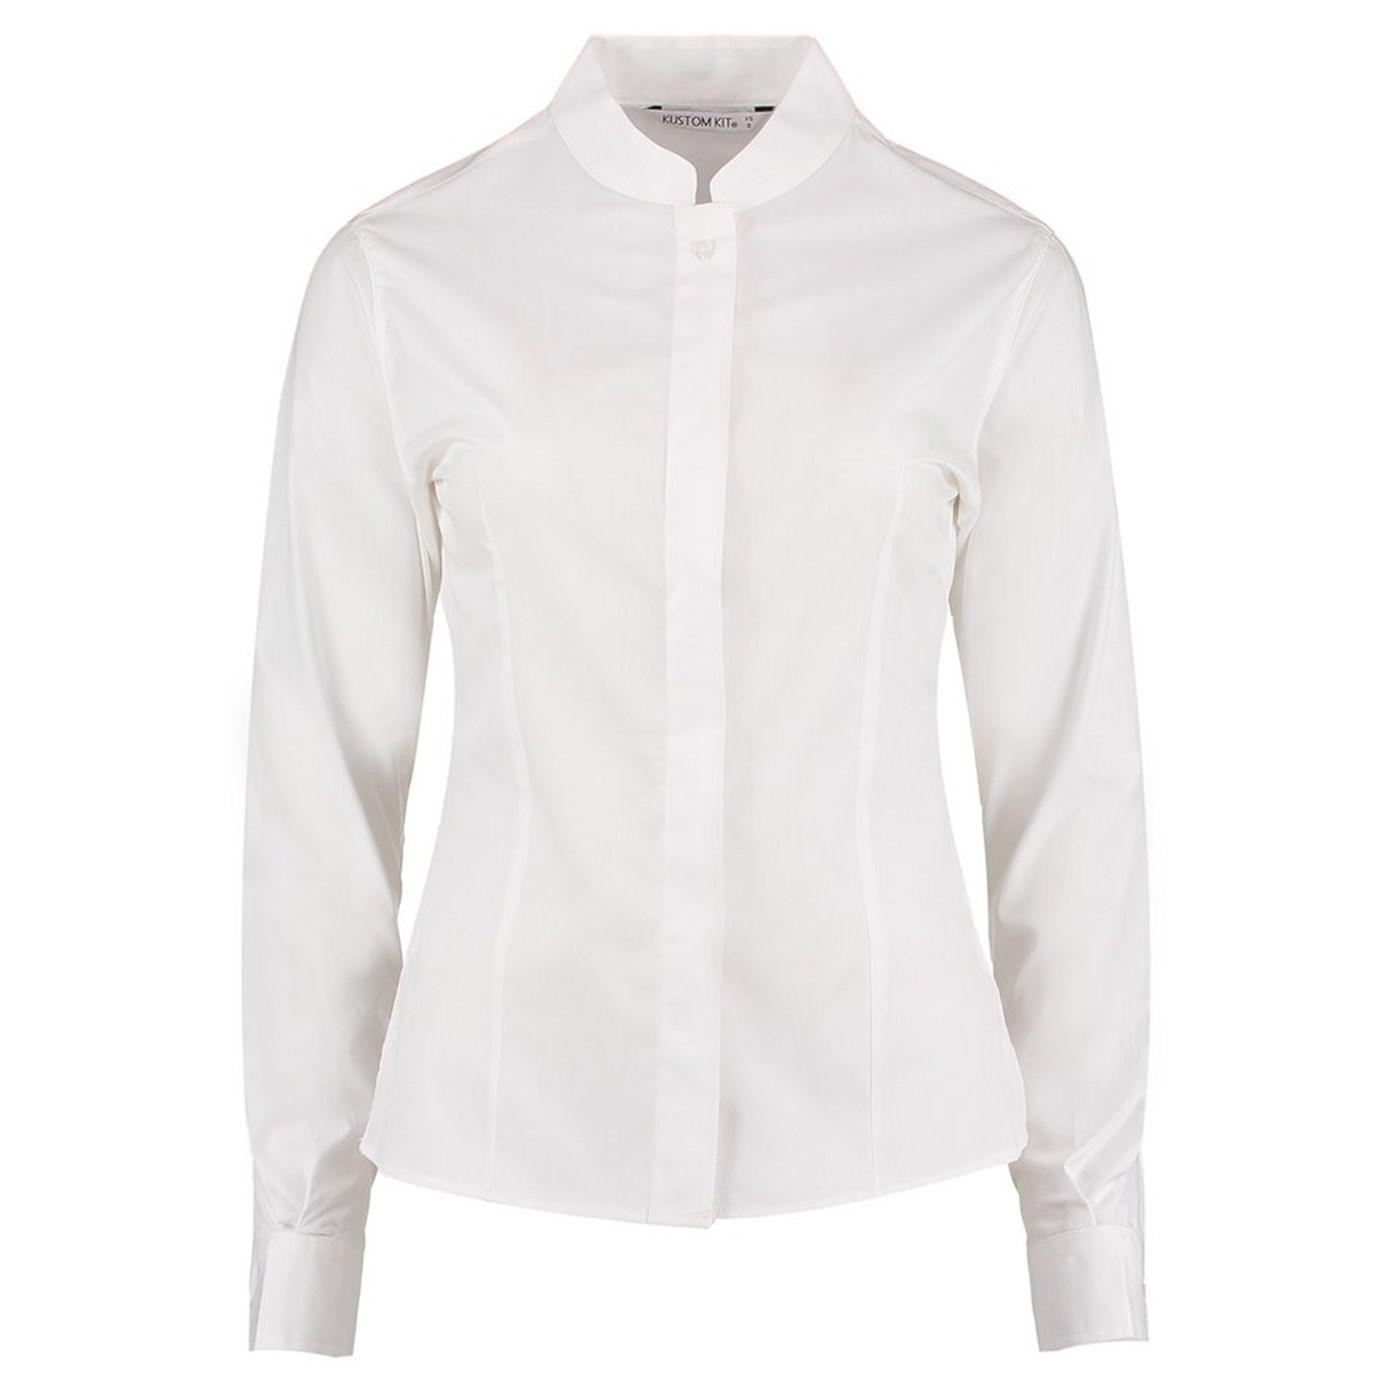 NEEKEY Mens T Shirts /Mens Summer Casual African Print Pullover Short Sleeved T-Shirt Top Blouse